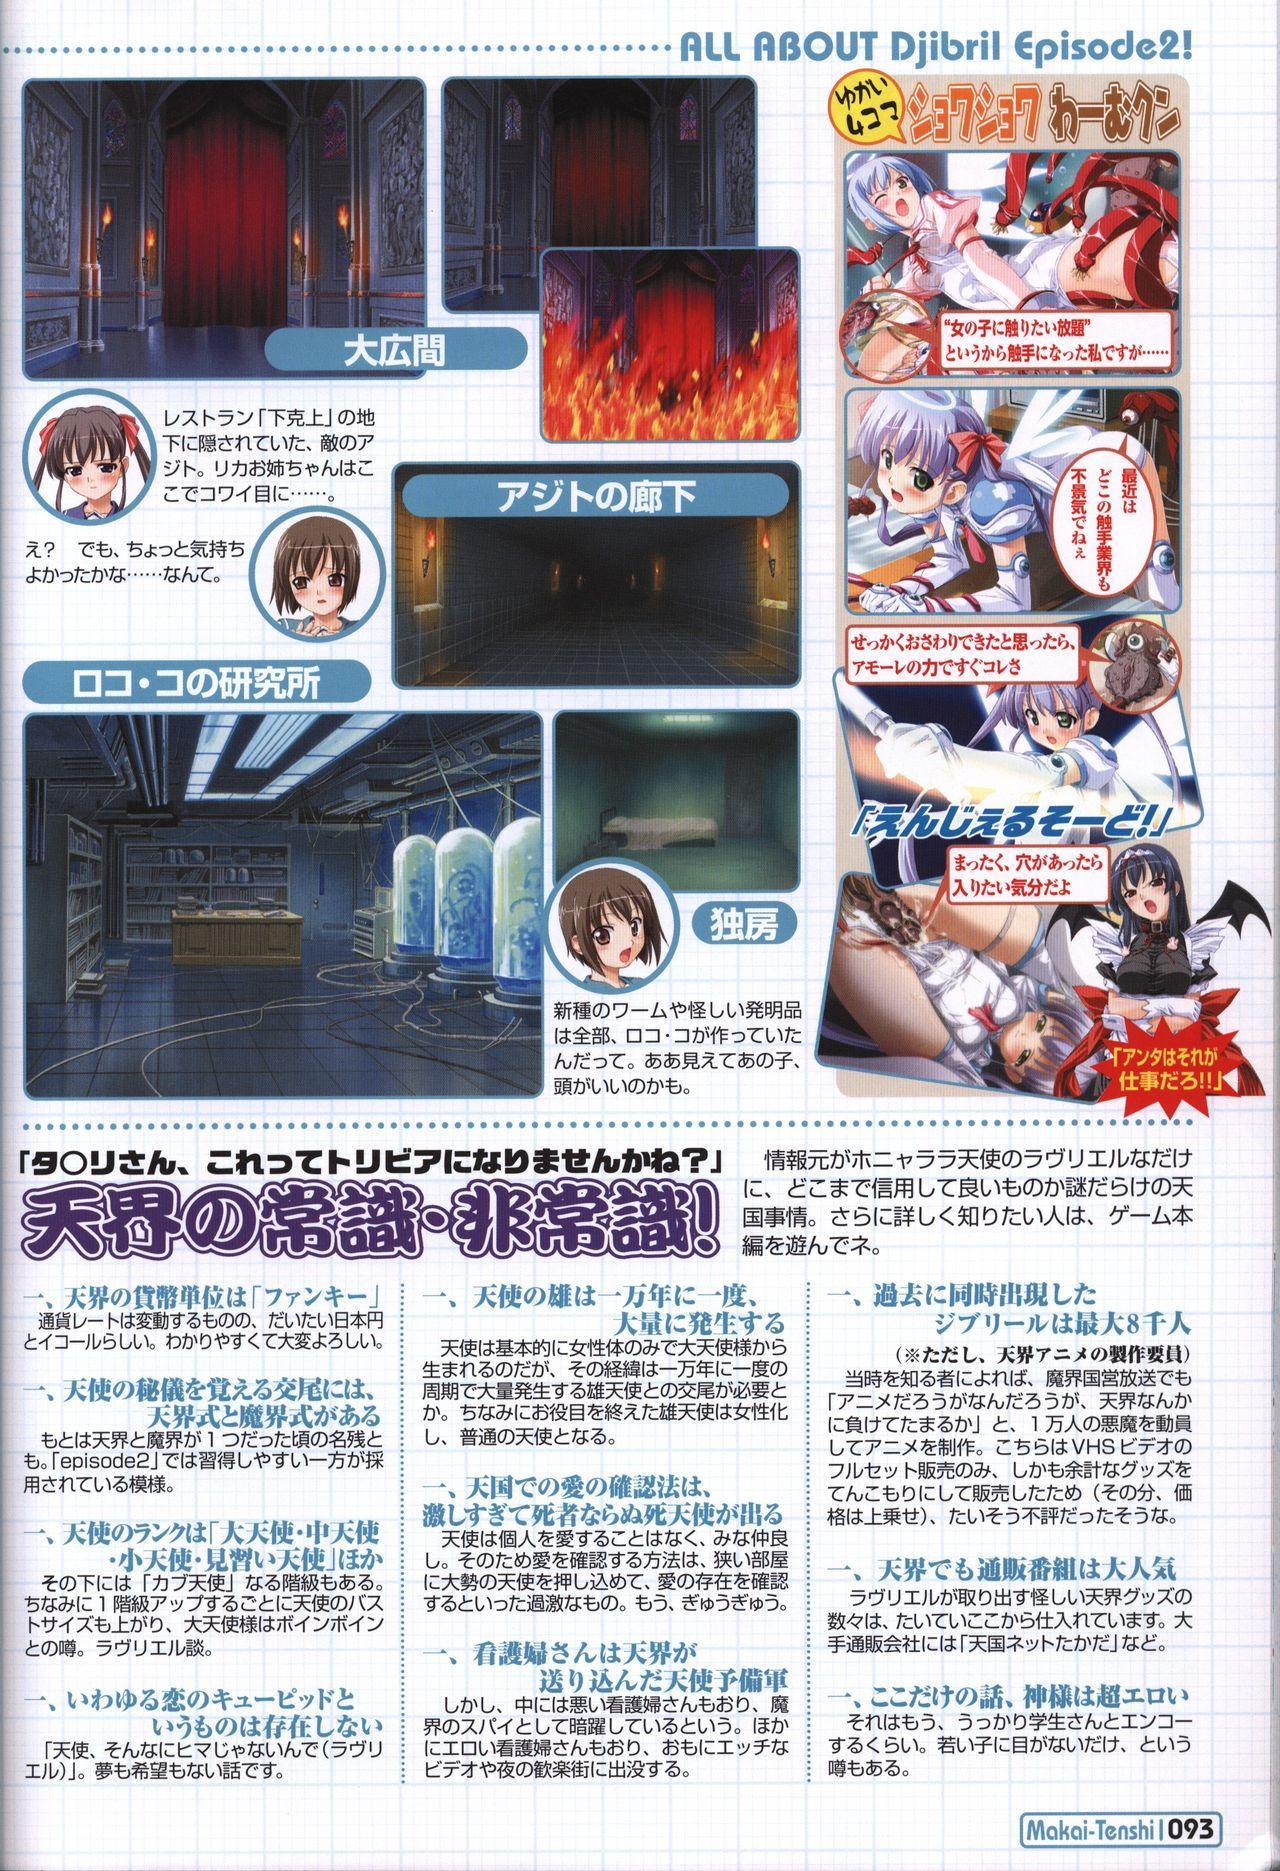 Makai Tenshi Jibril~EPISODE 2~ official fanbook 89